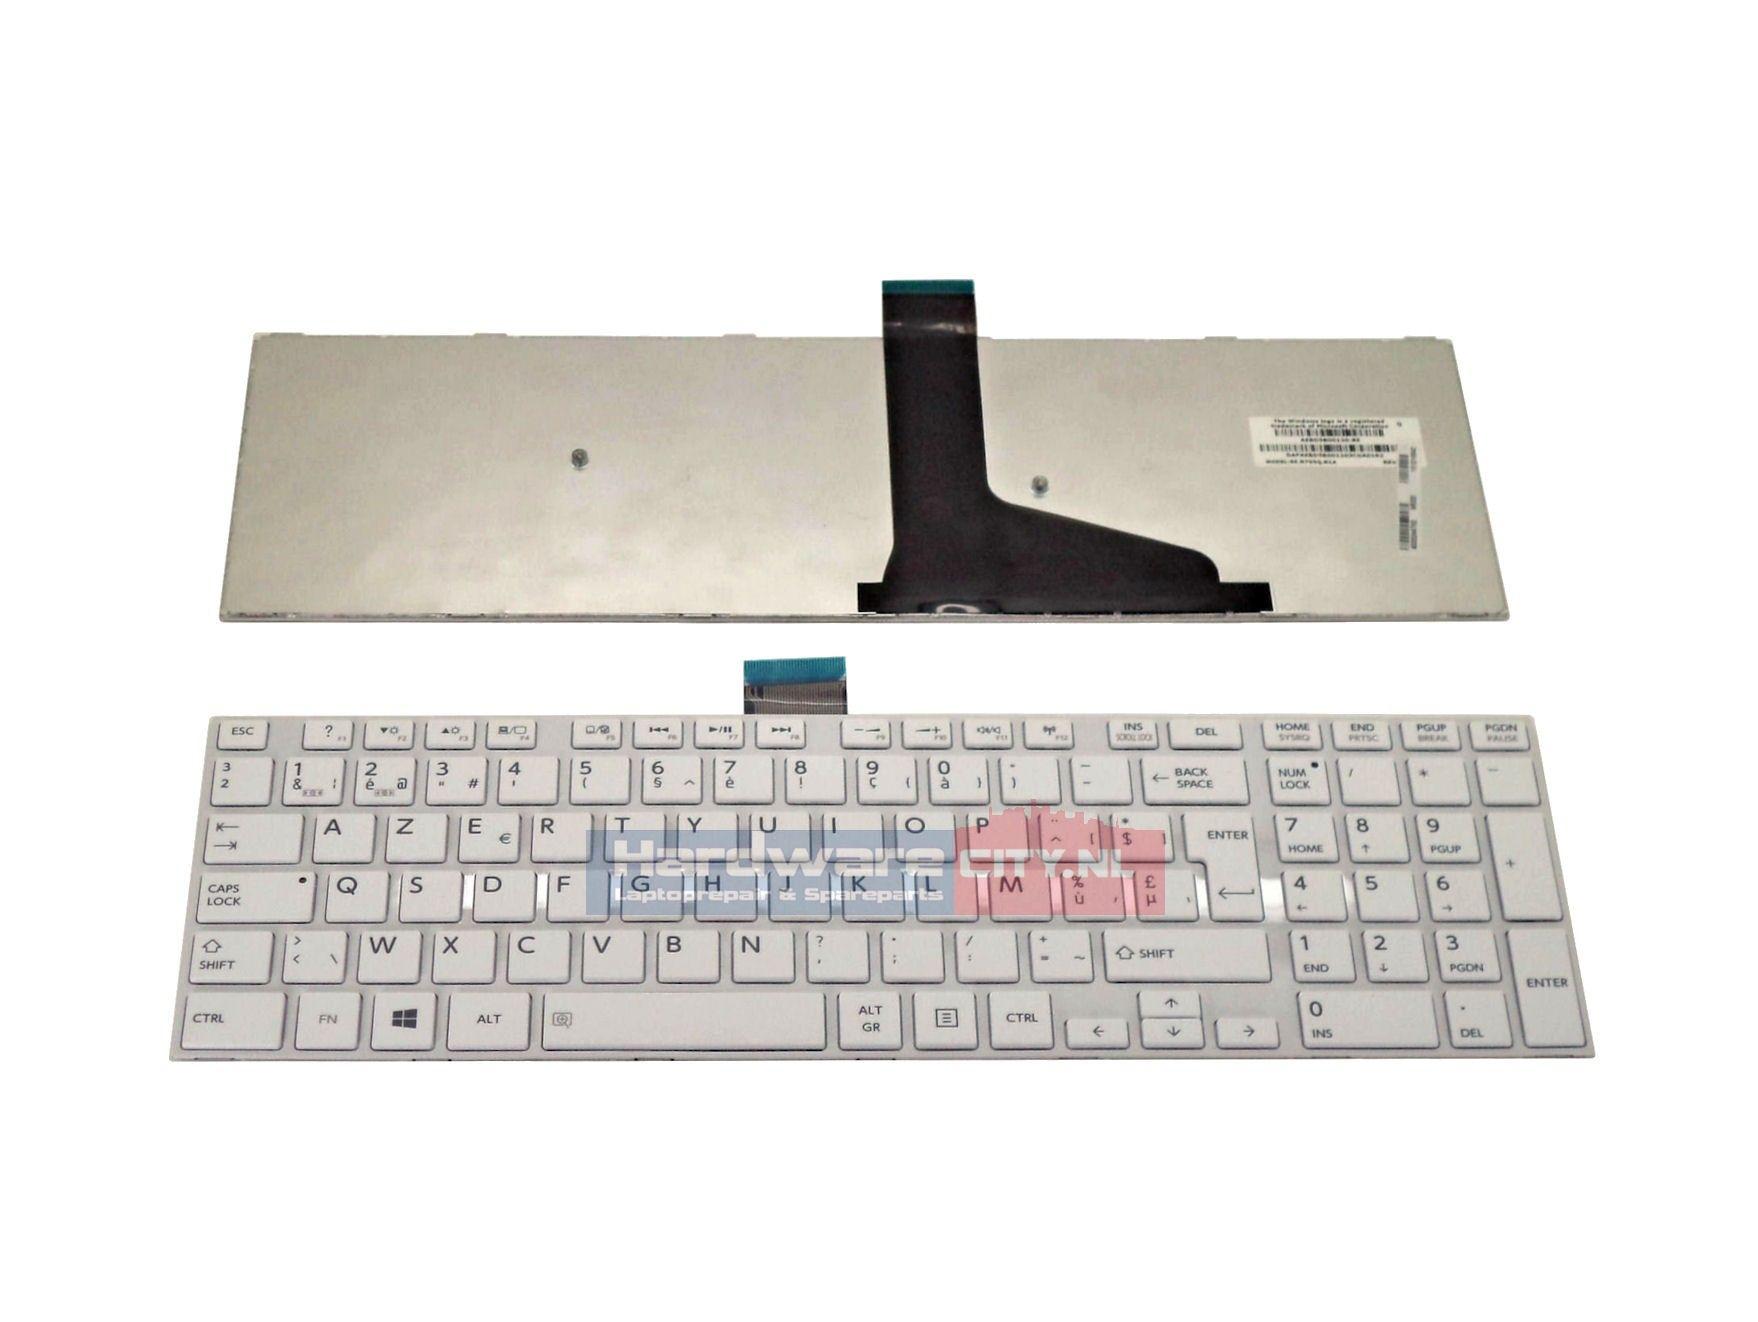 Toshiba Satellite L50/ L70 series BE keyboard (wit)